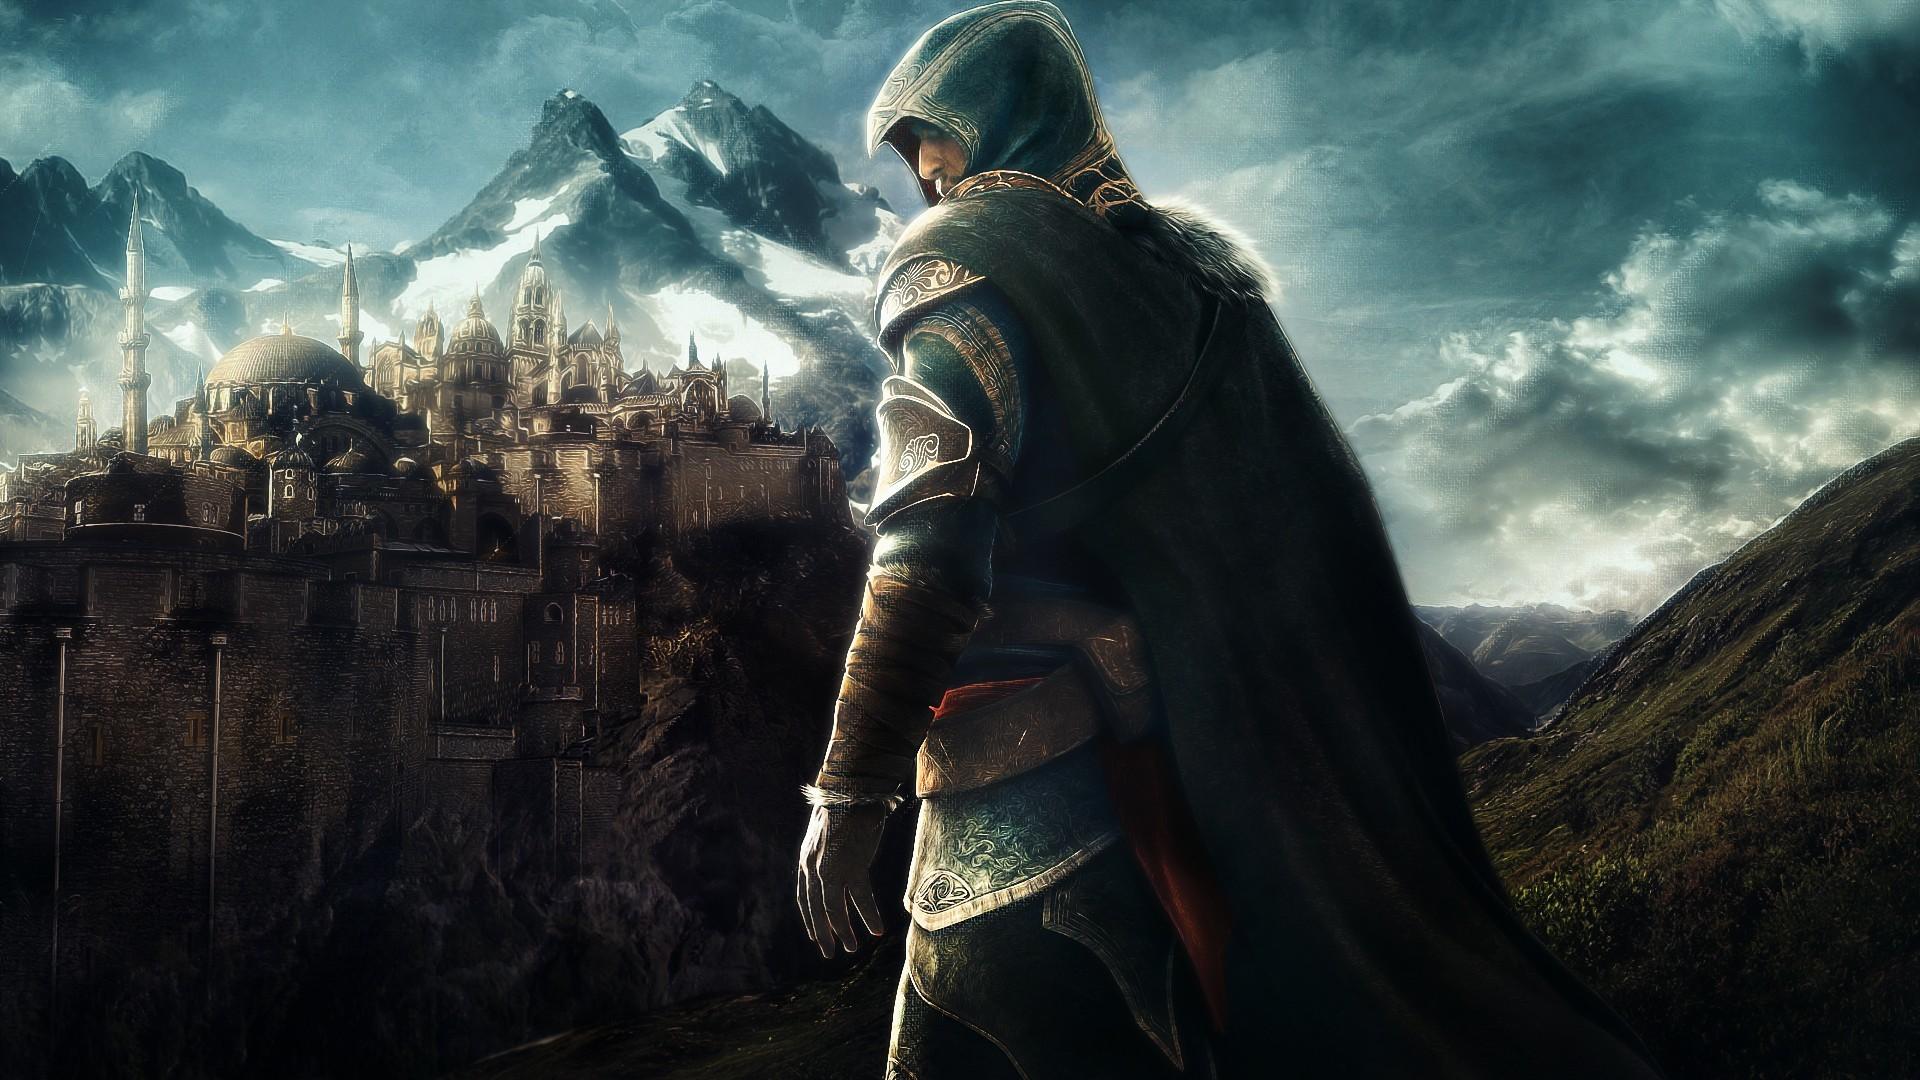 Gaming Wallpapers: Epic Gaming Wallpaper (72+ Images